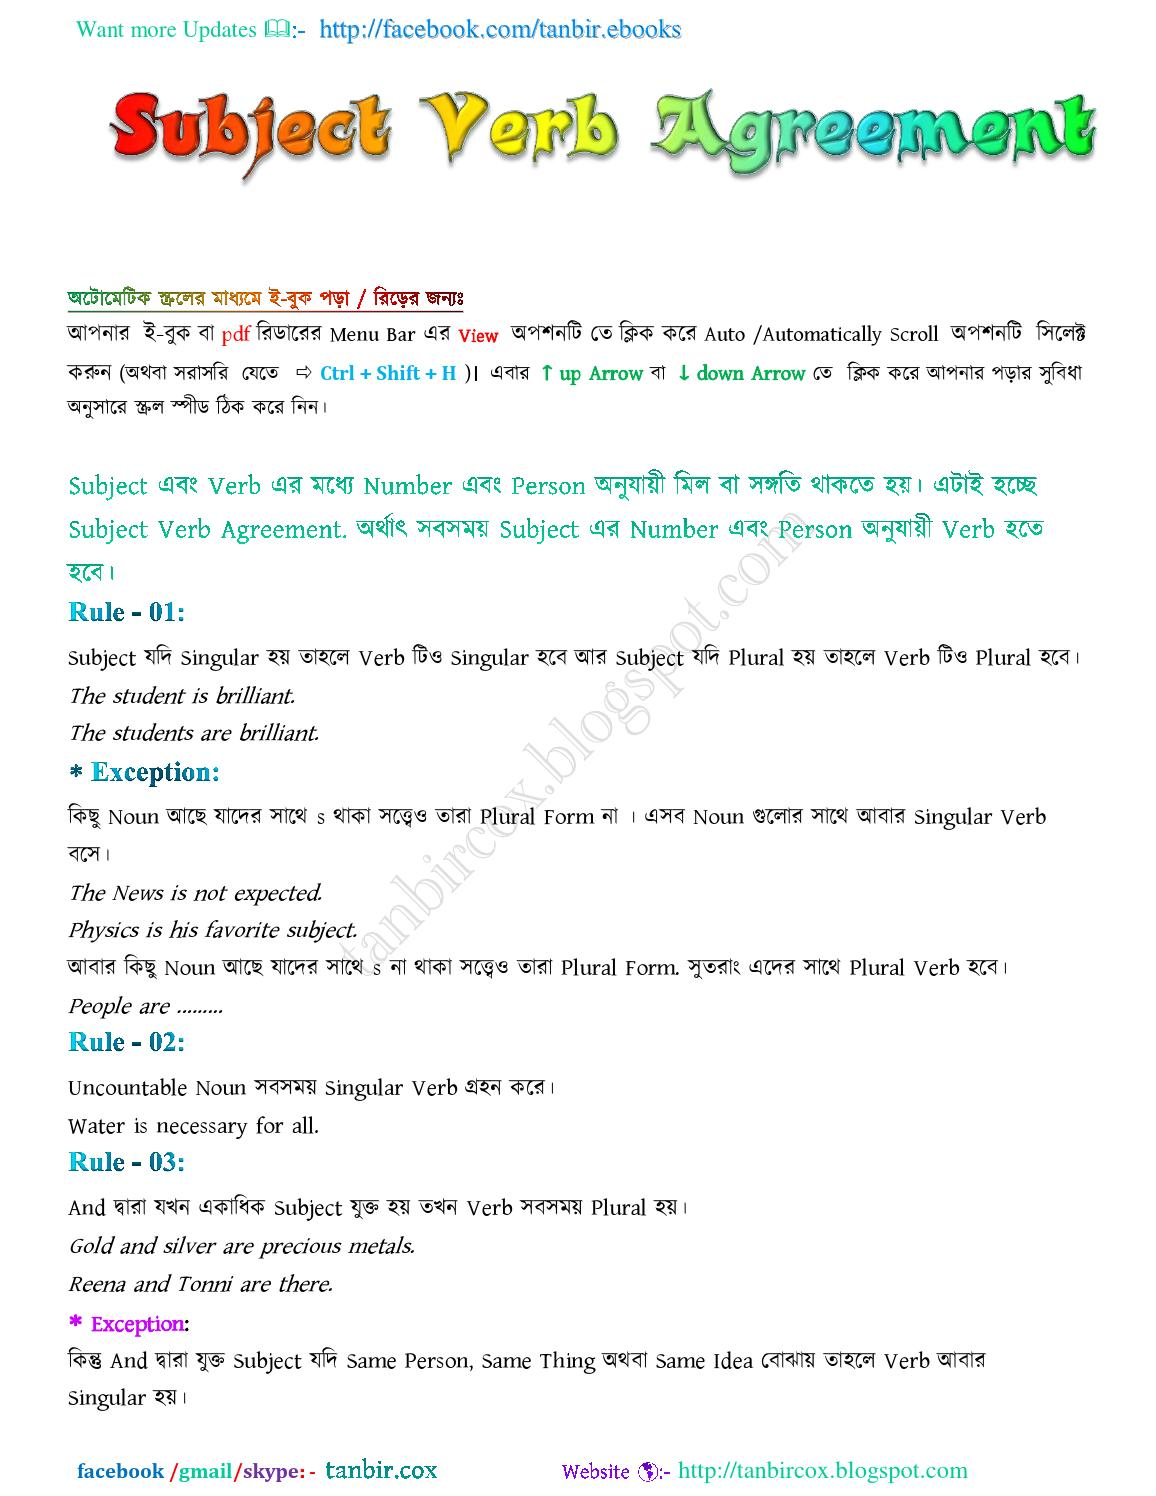 Eg subject verb agreementby tanbircox by tanbircox - issuu